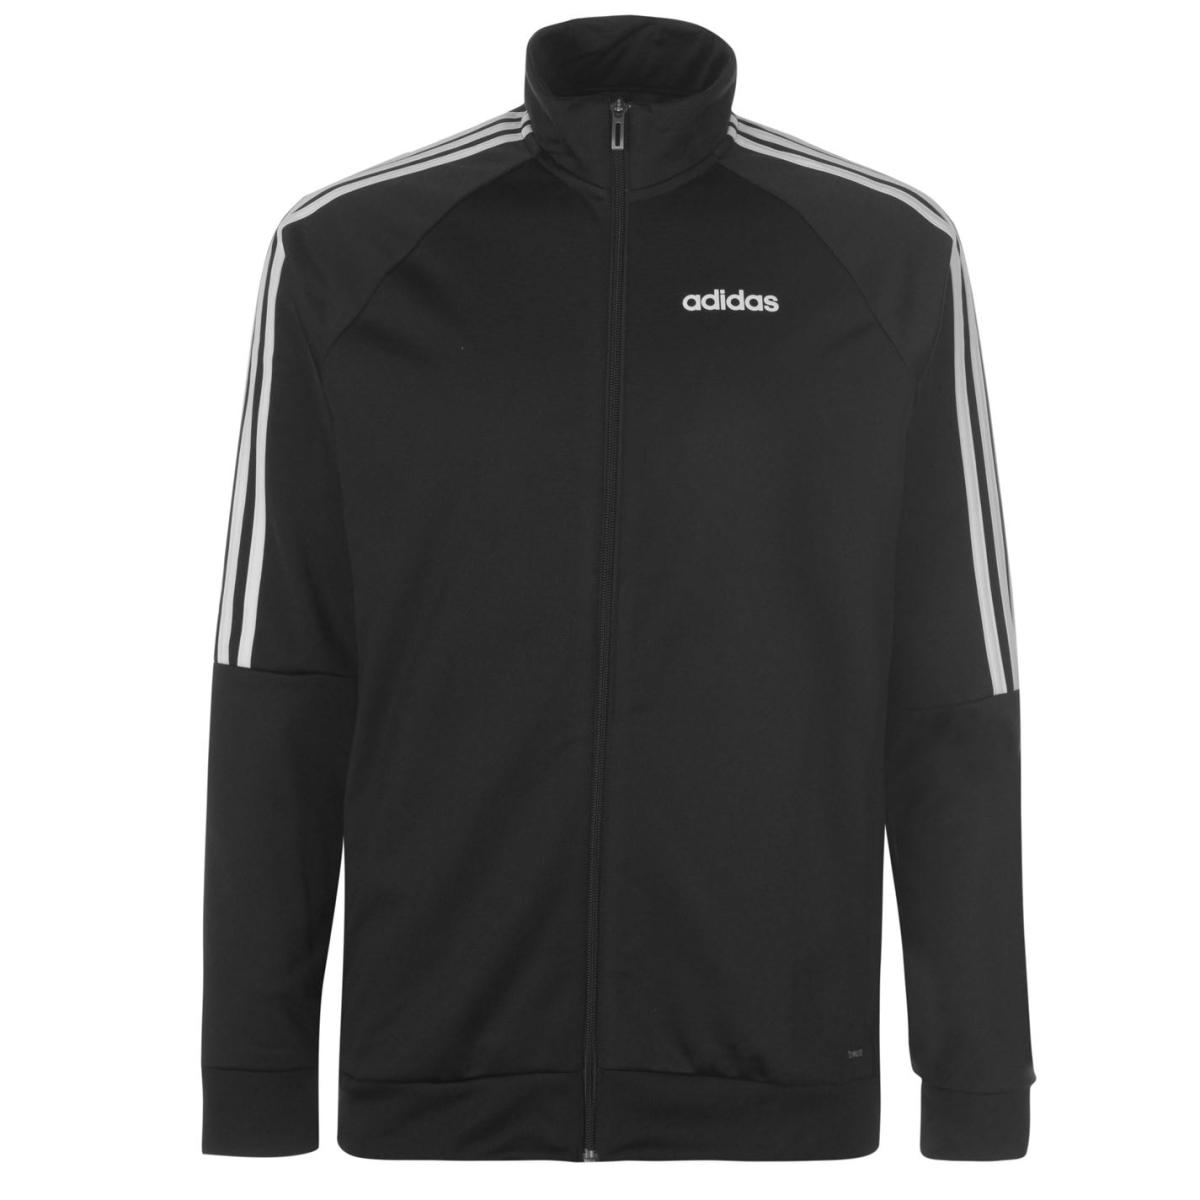 adidas Tiro 2 Trainingsanzug Sportanzug Herren Fußball Jogginganzug 8419